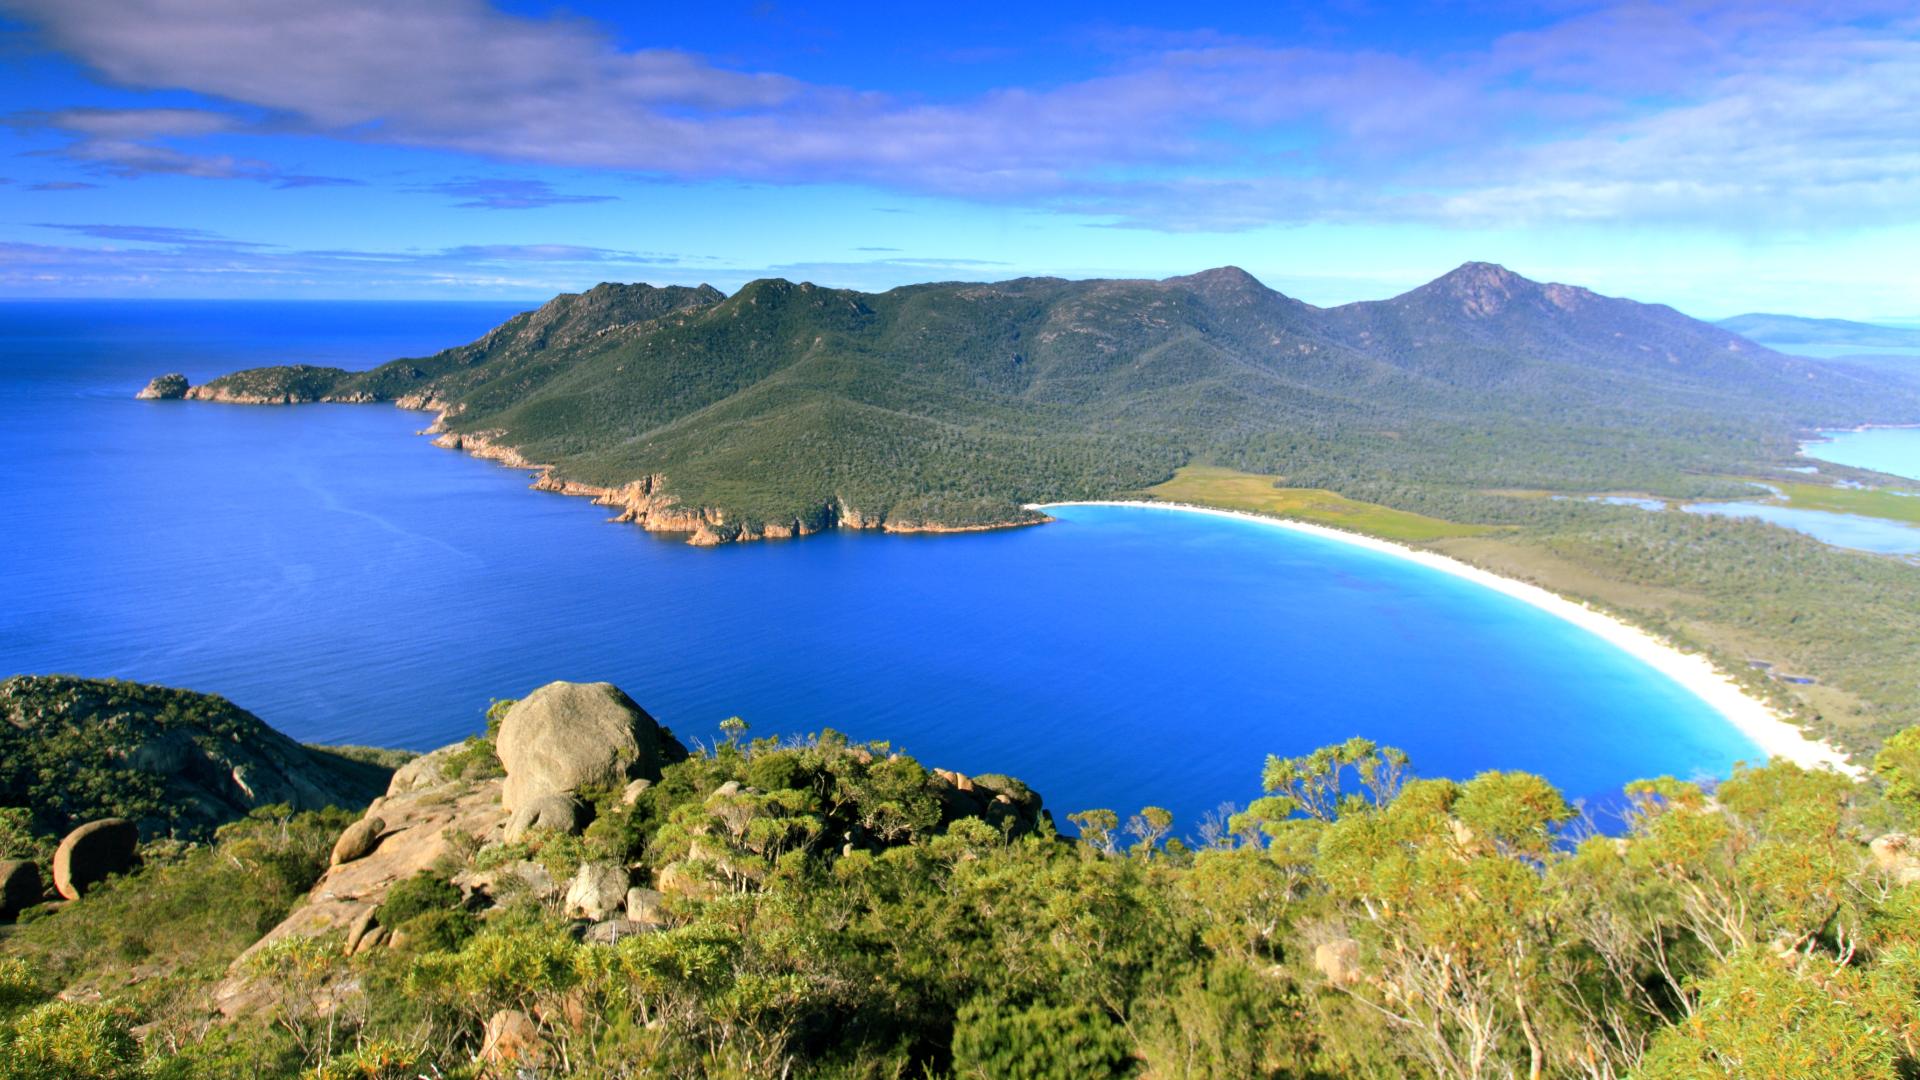 Enjoy scenic cruising along Tassie's east coast